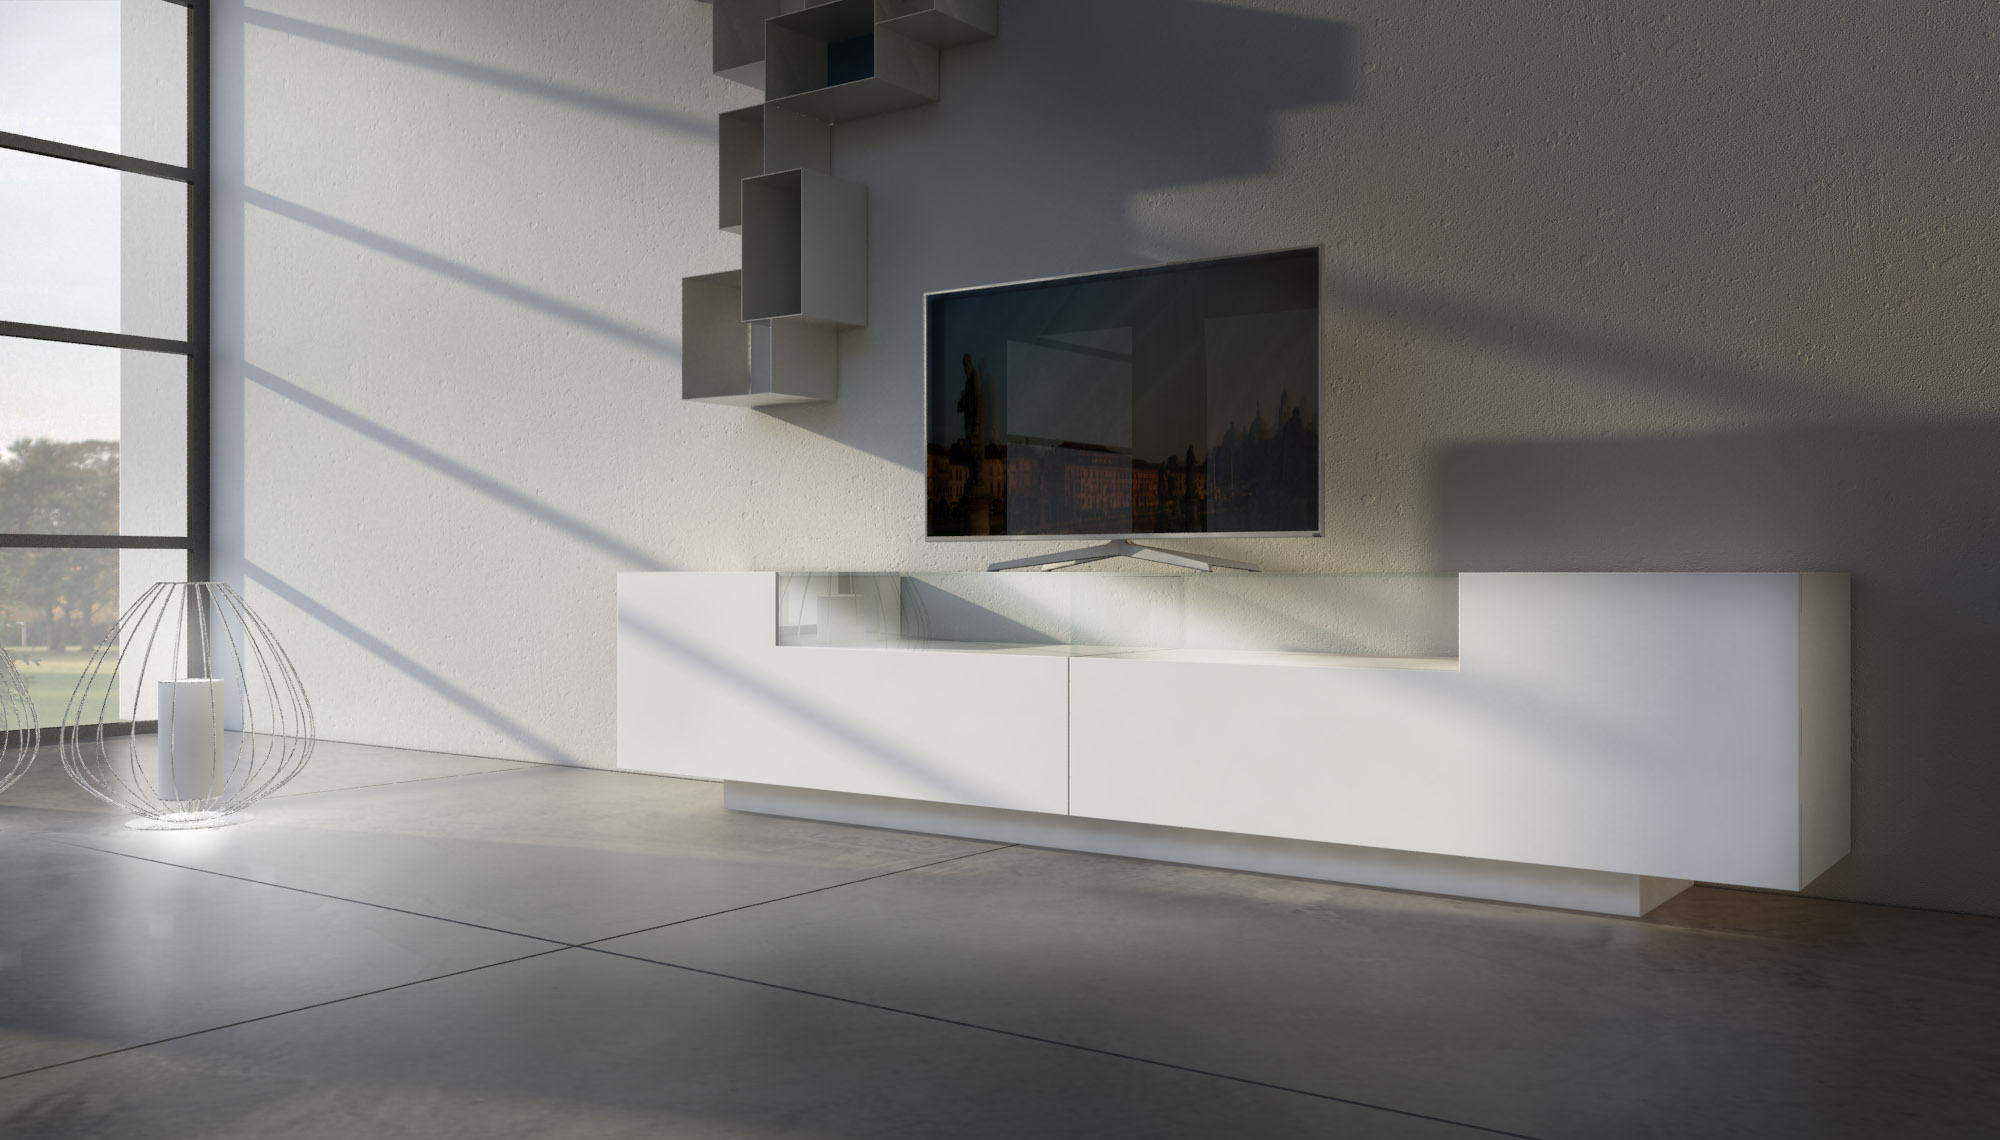 mobili porta tv moderni bassi | voltan mobili - Mobili Tv Bassi Moderni